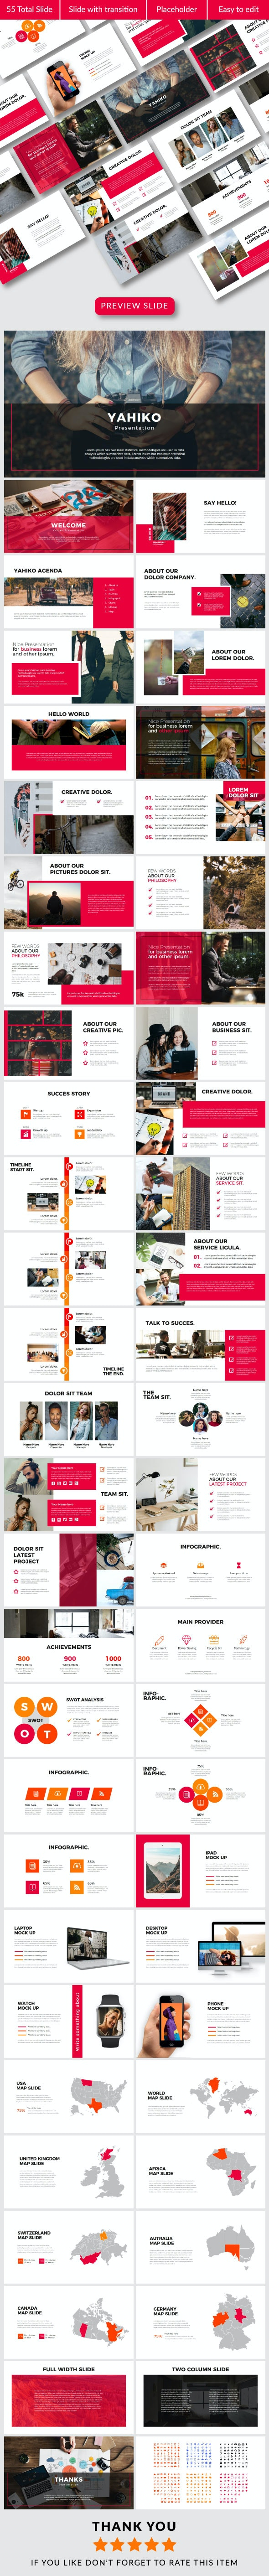 Yahiko Powerpoint Temp - Business PowerPoint Templates